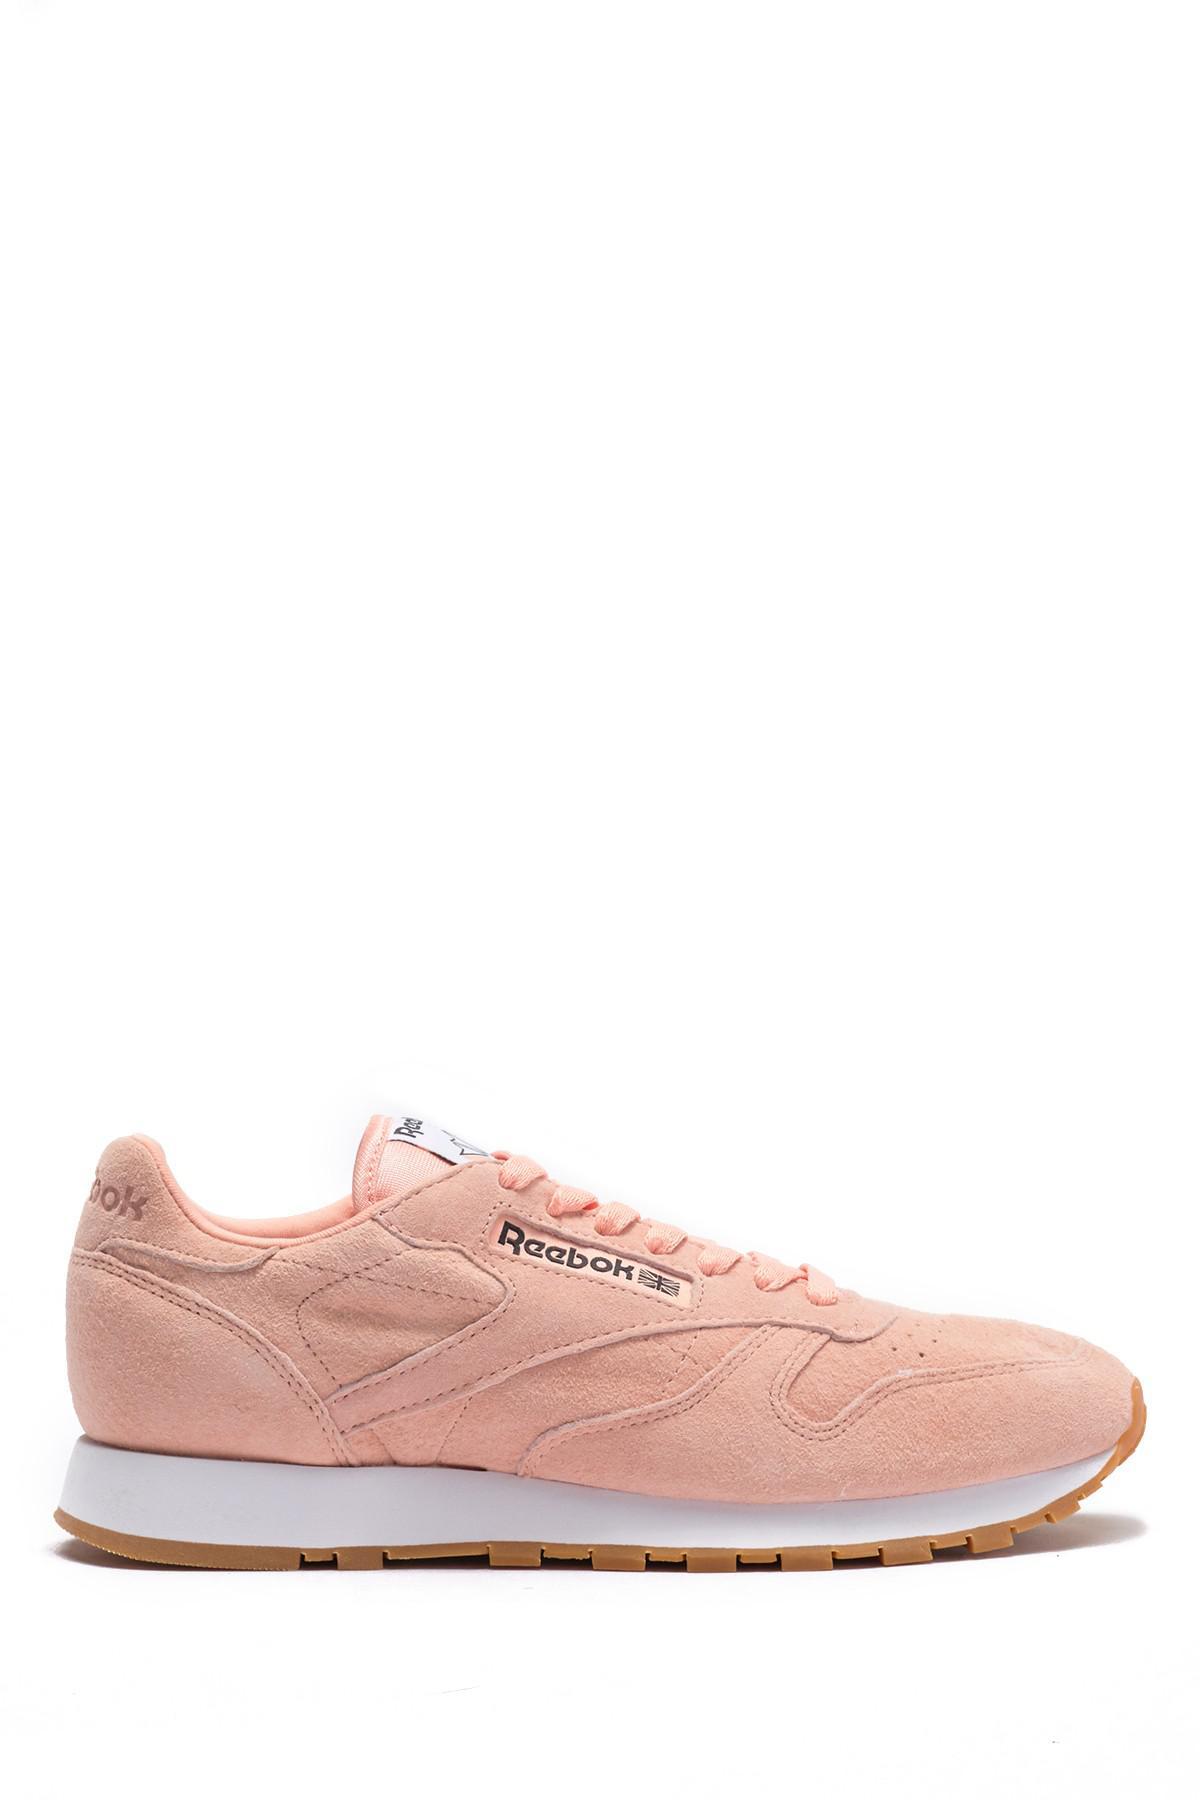 771862ed0e59 Reebok - Pink Classic Suede Pastel Ebk Sneaker for Men - Lyst. View  fullscreen